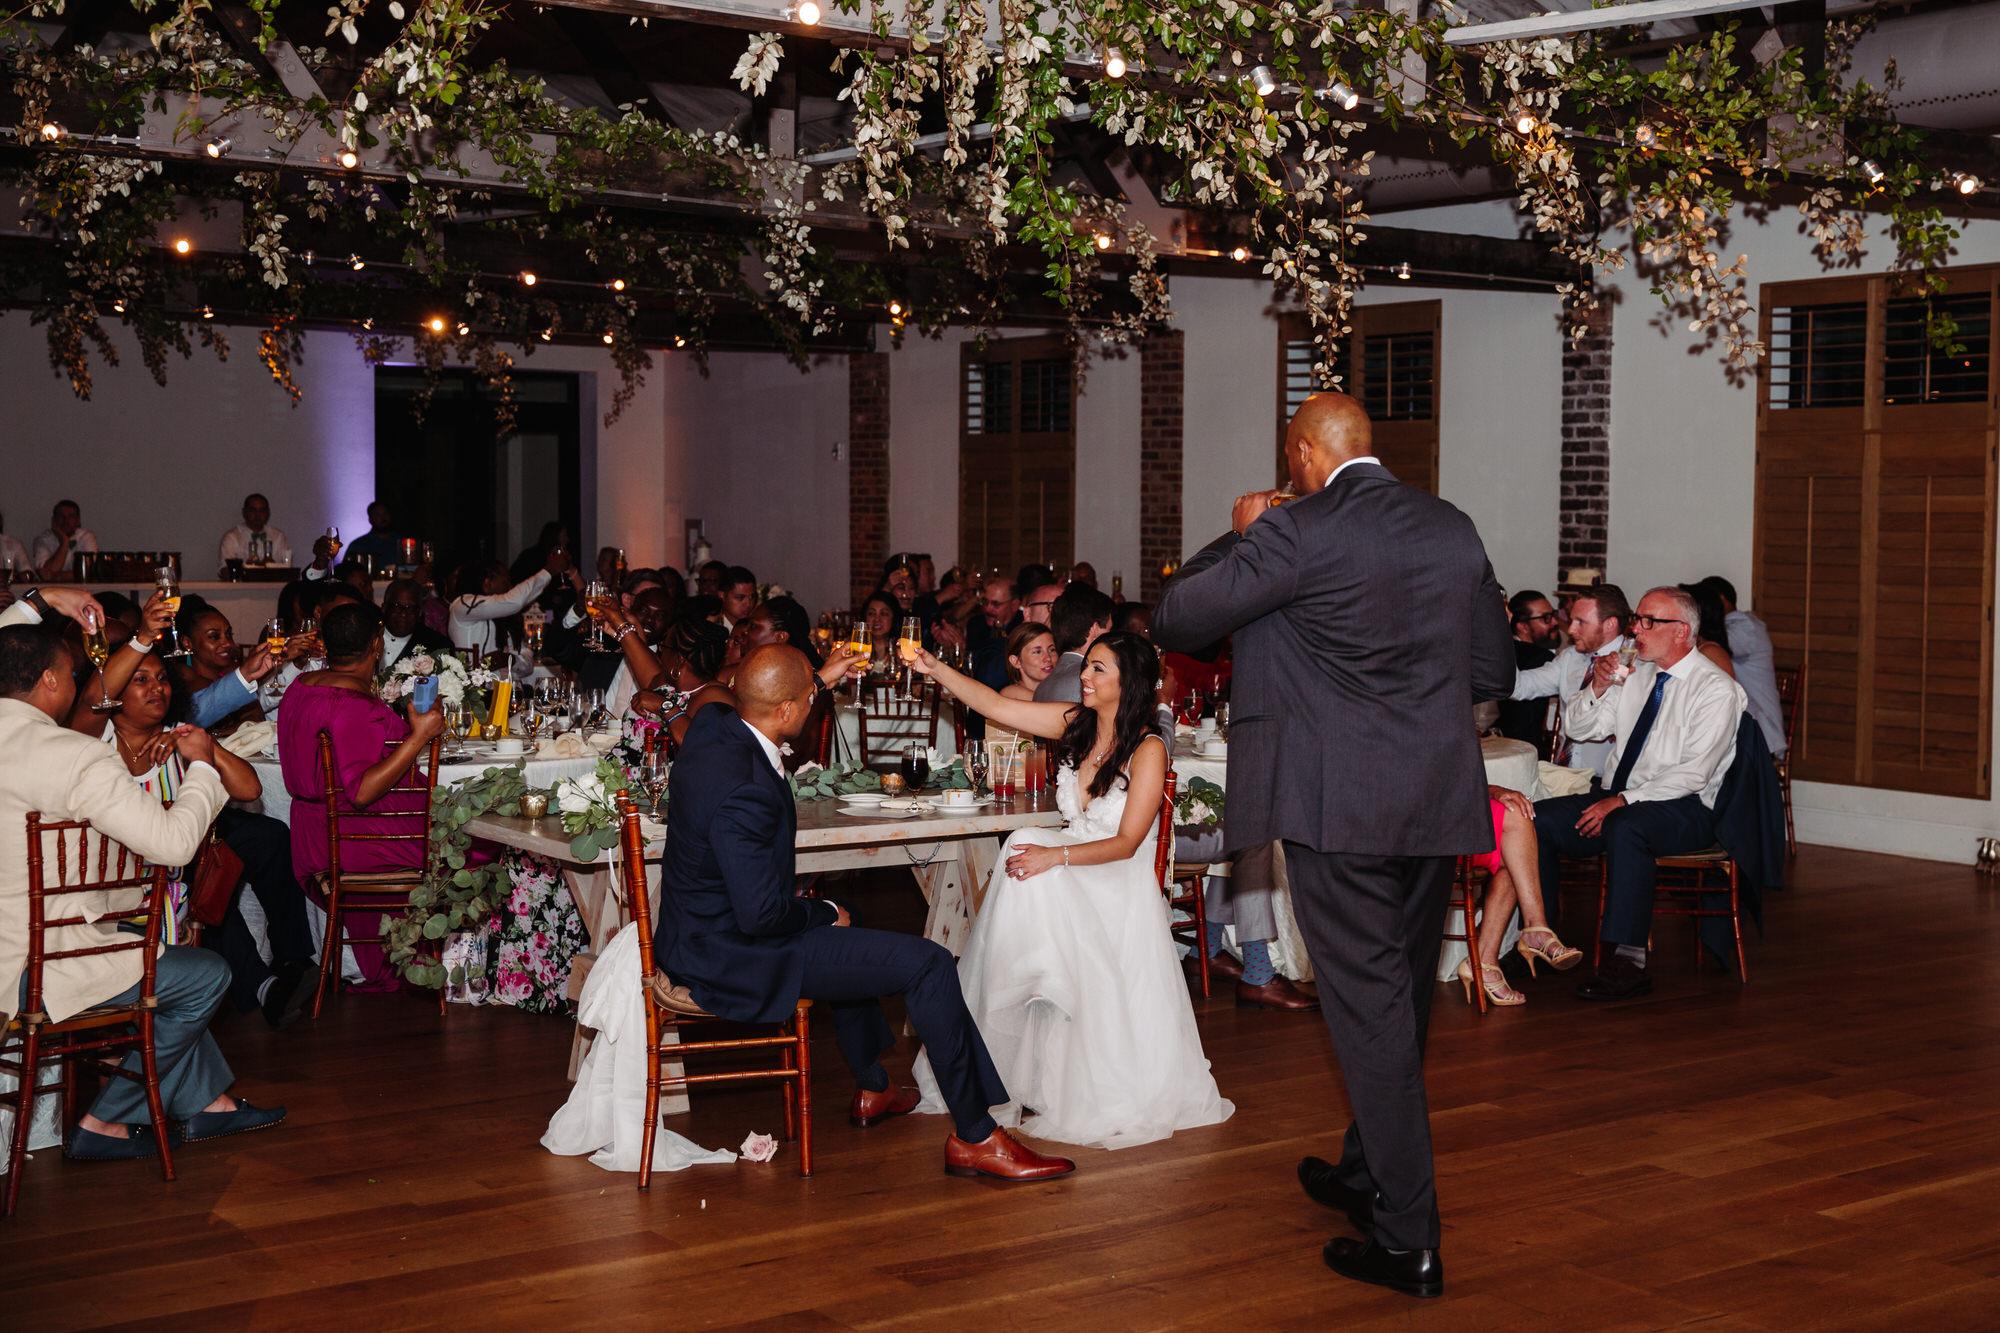 st-lukes-chapel-cannon-green-charleston-wedding-1010.JPG